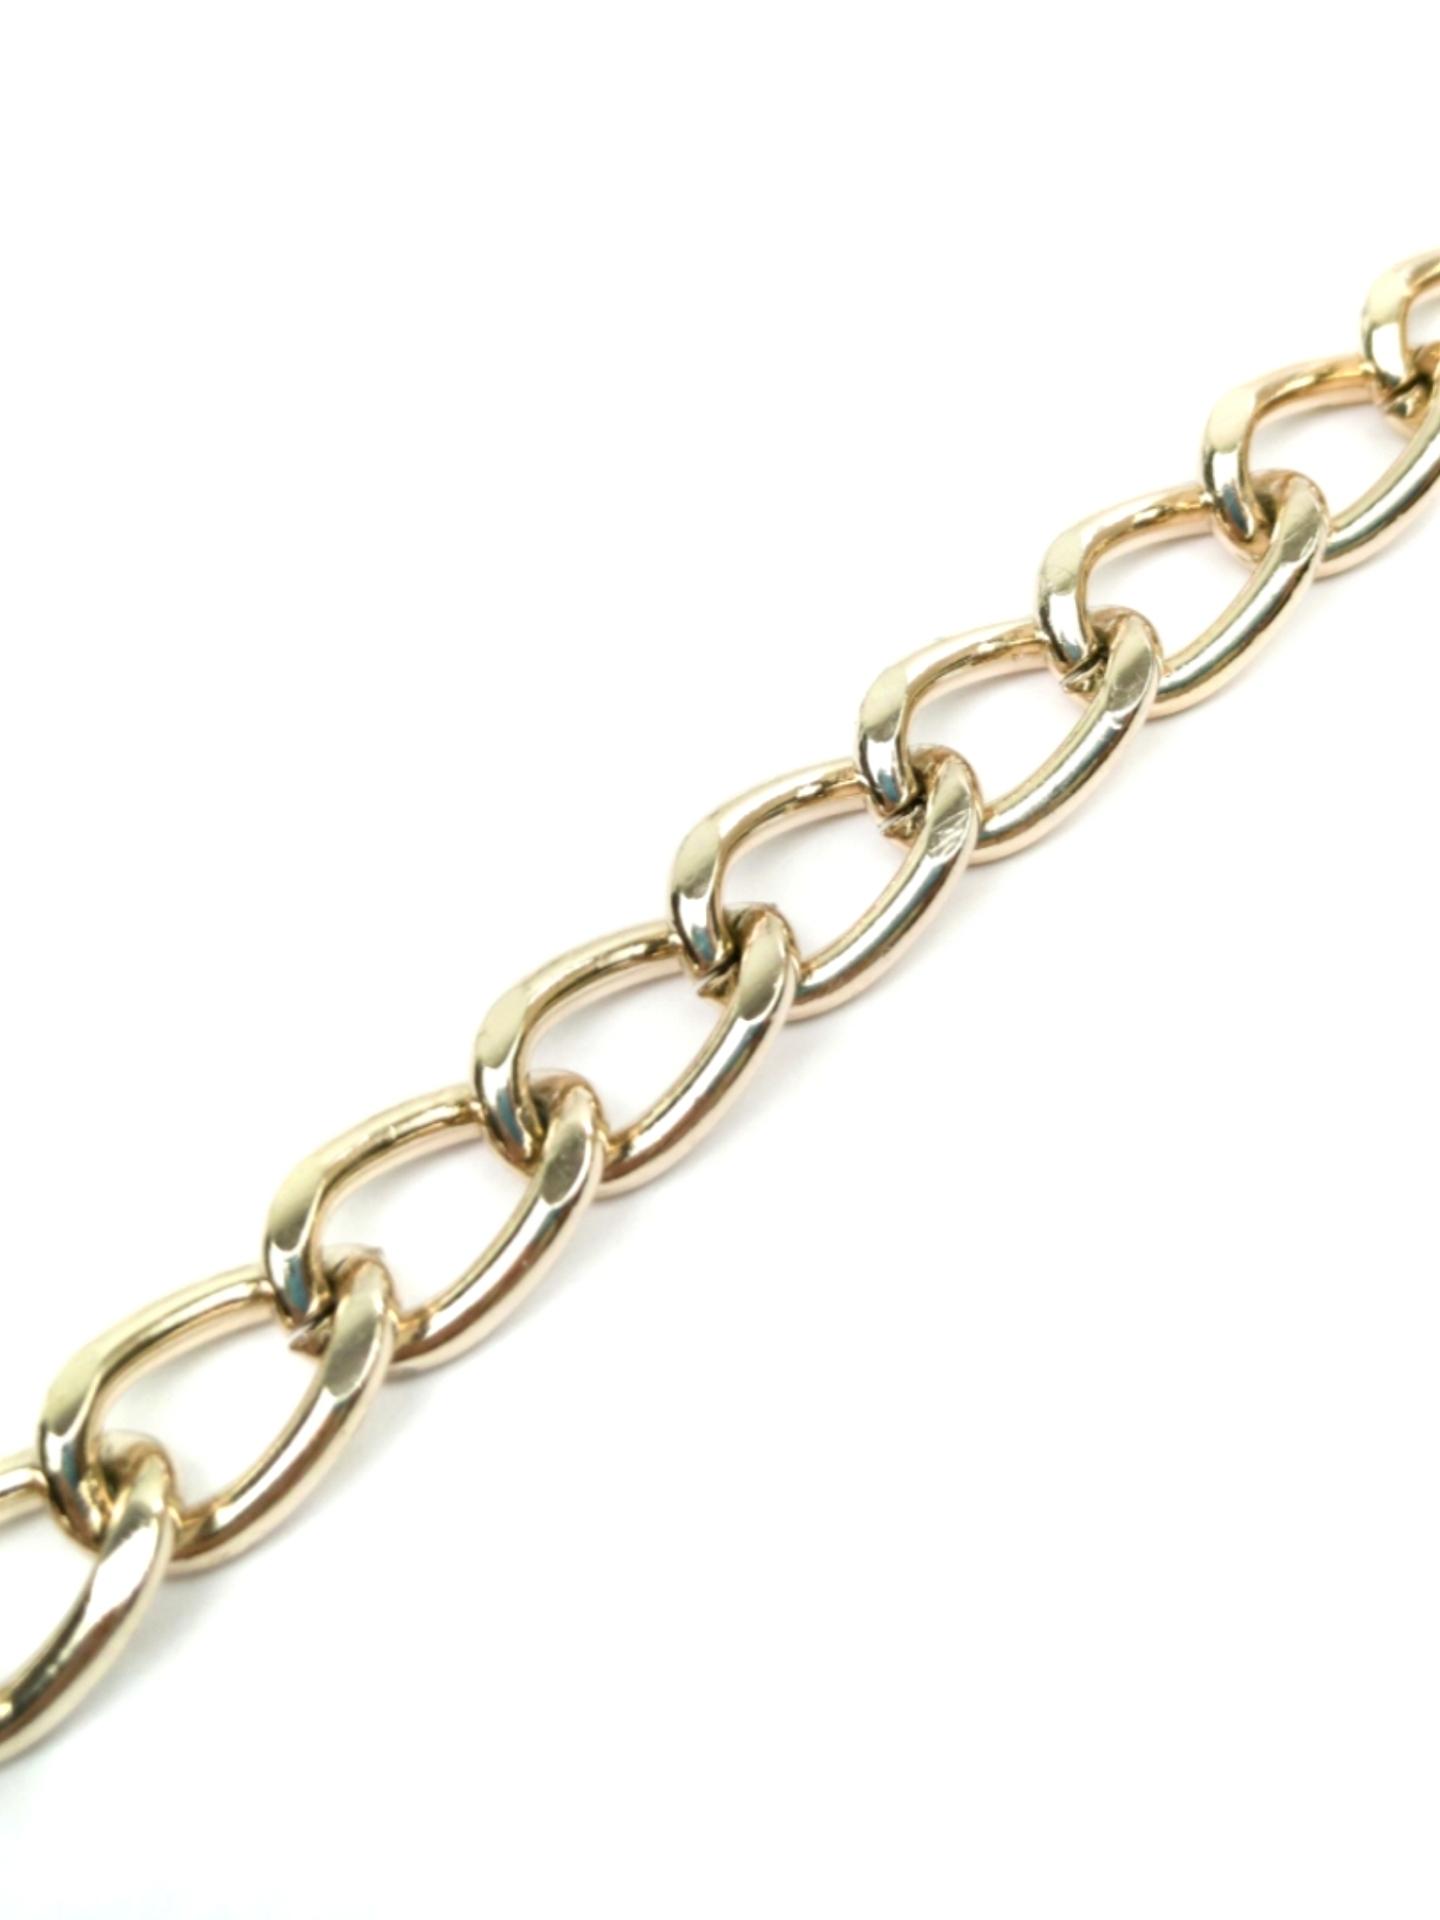 Цепочки Цепочка для сумки 10,7мм без карабинов золото LRM_EXPORT_66670442229394_20191101_2318452571.jpeg